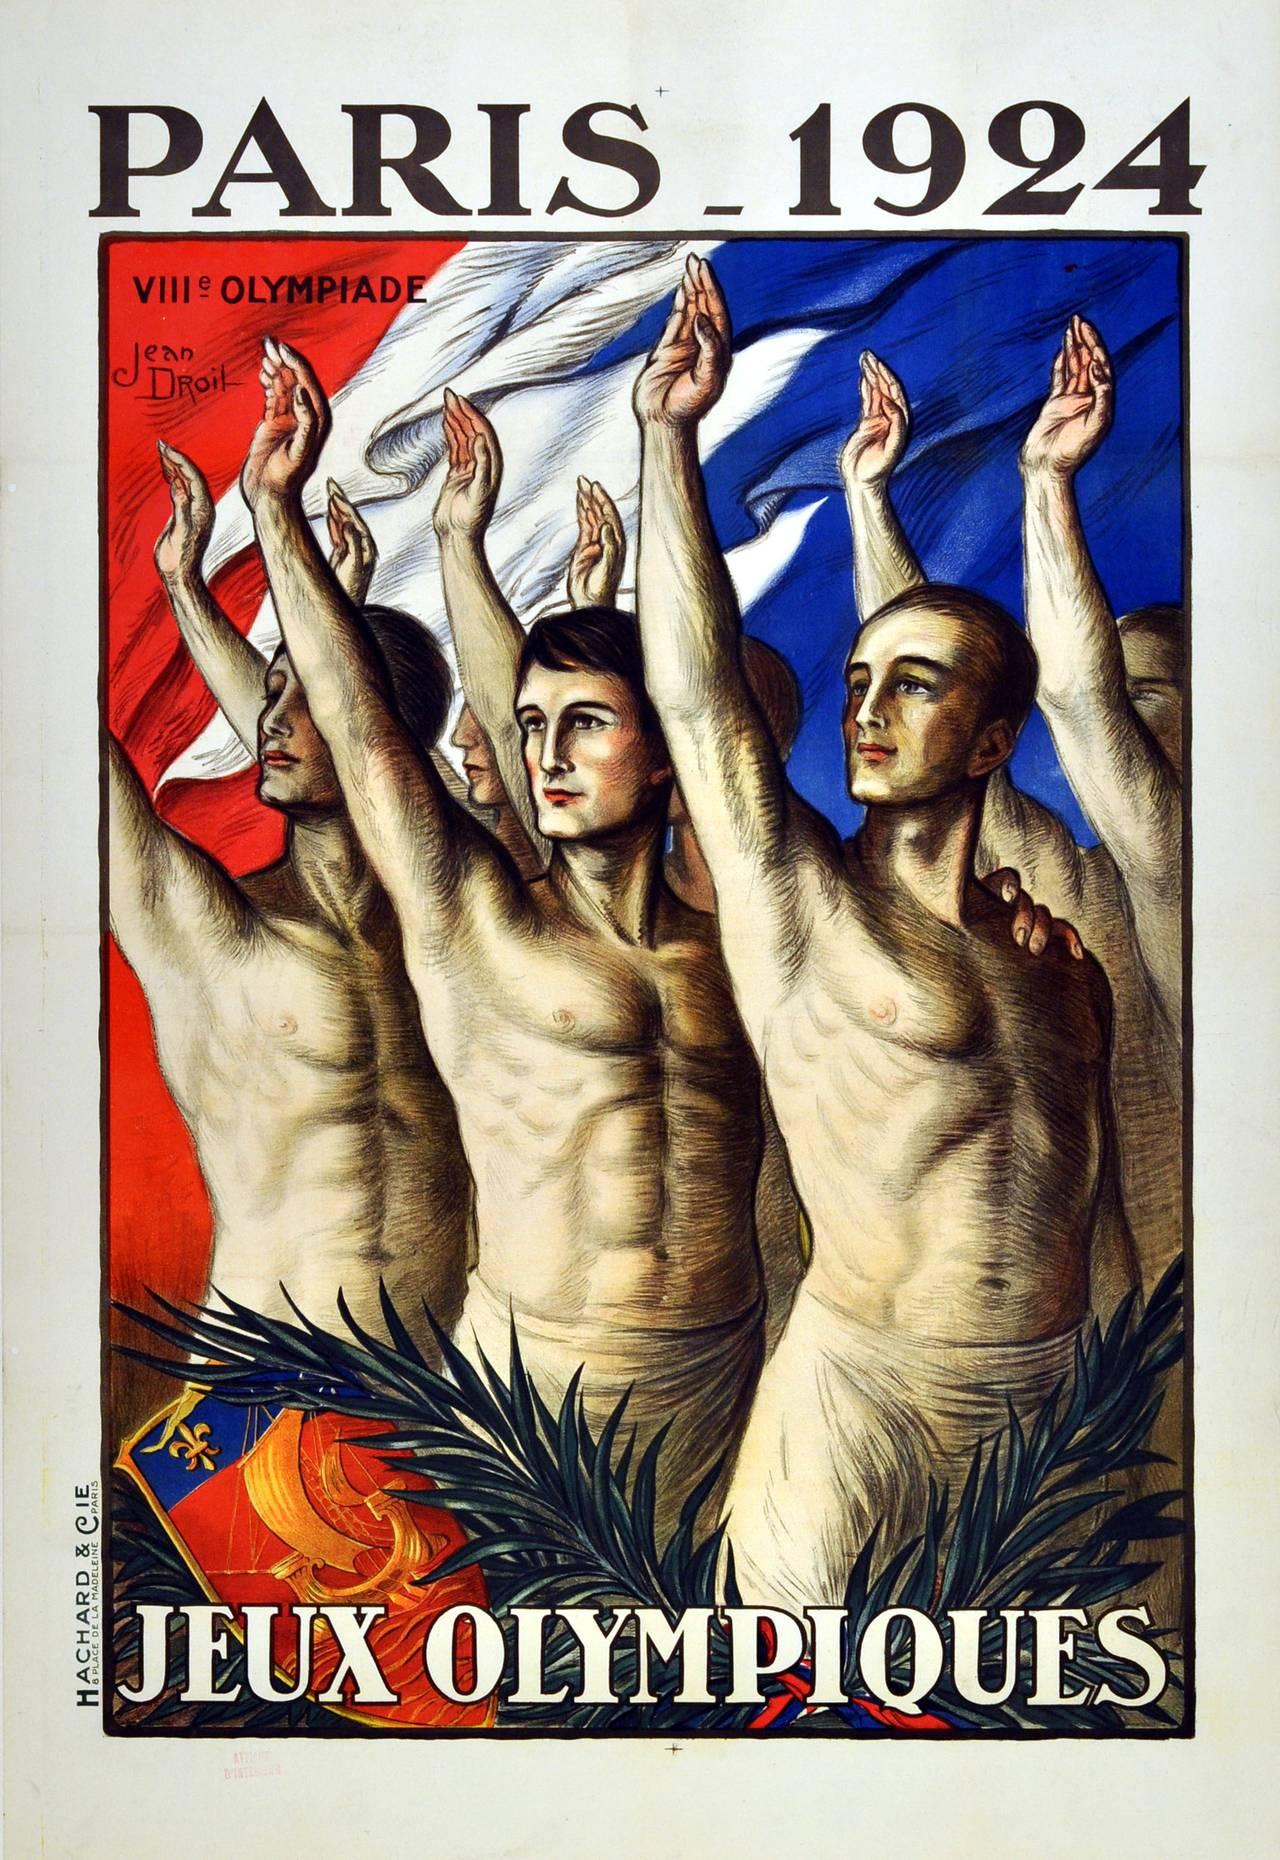 Paris 1924 Art Deco Olympics Poster